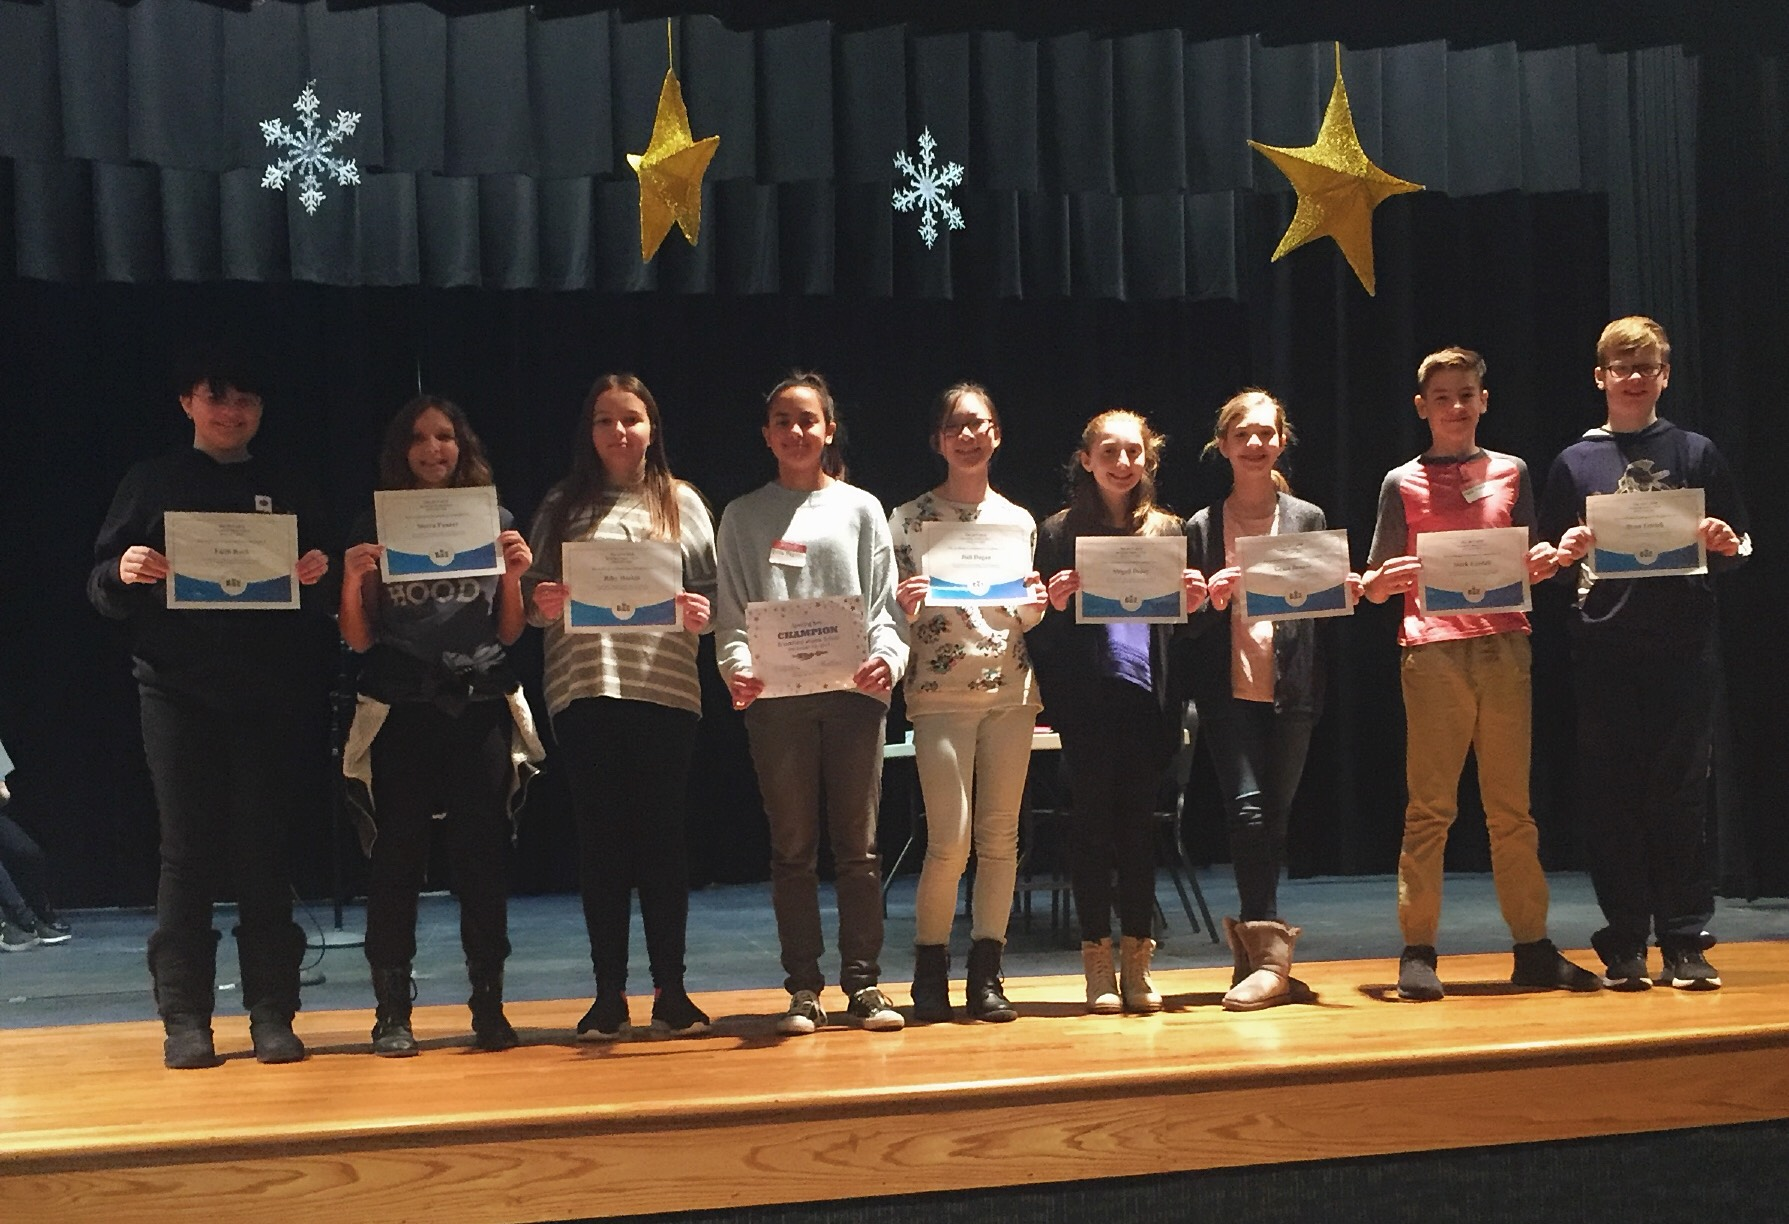 seventh grade spelling bee participants